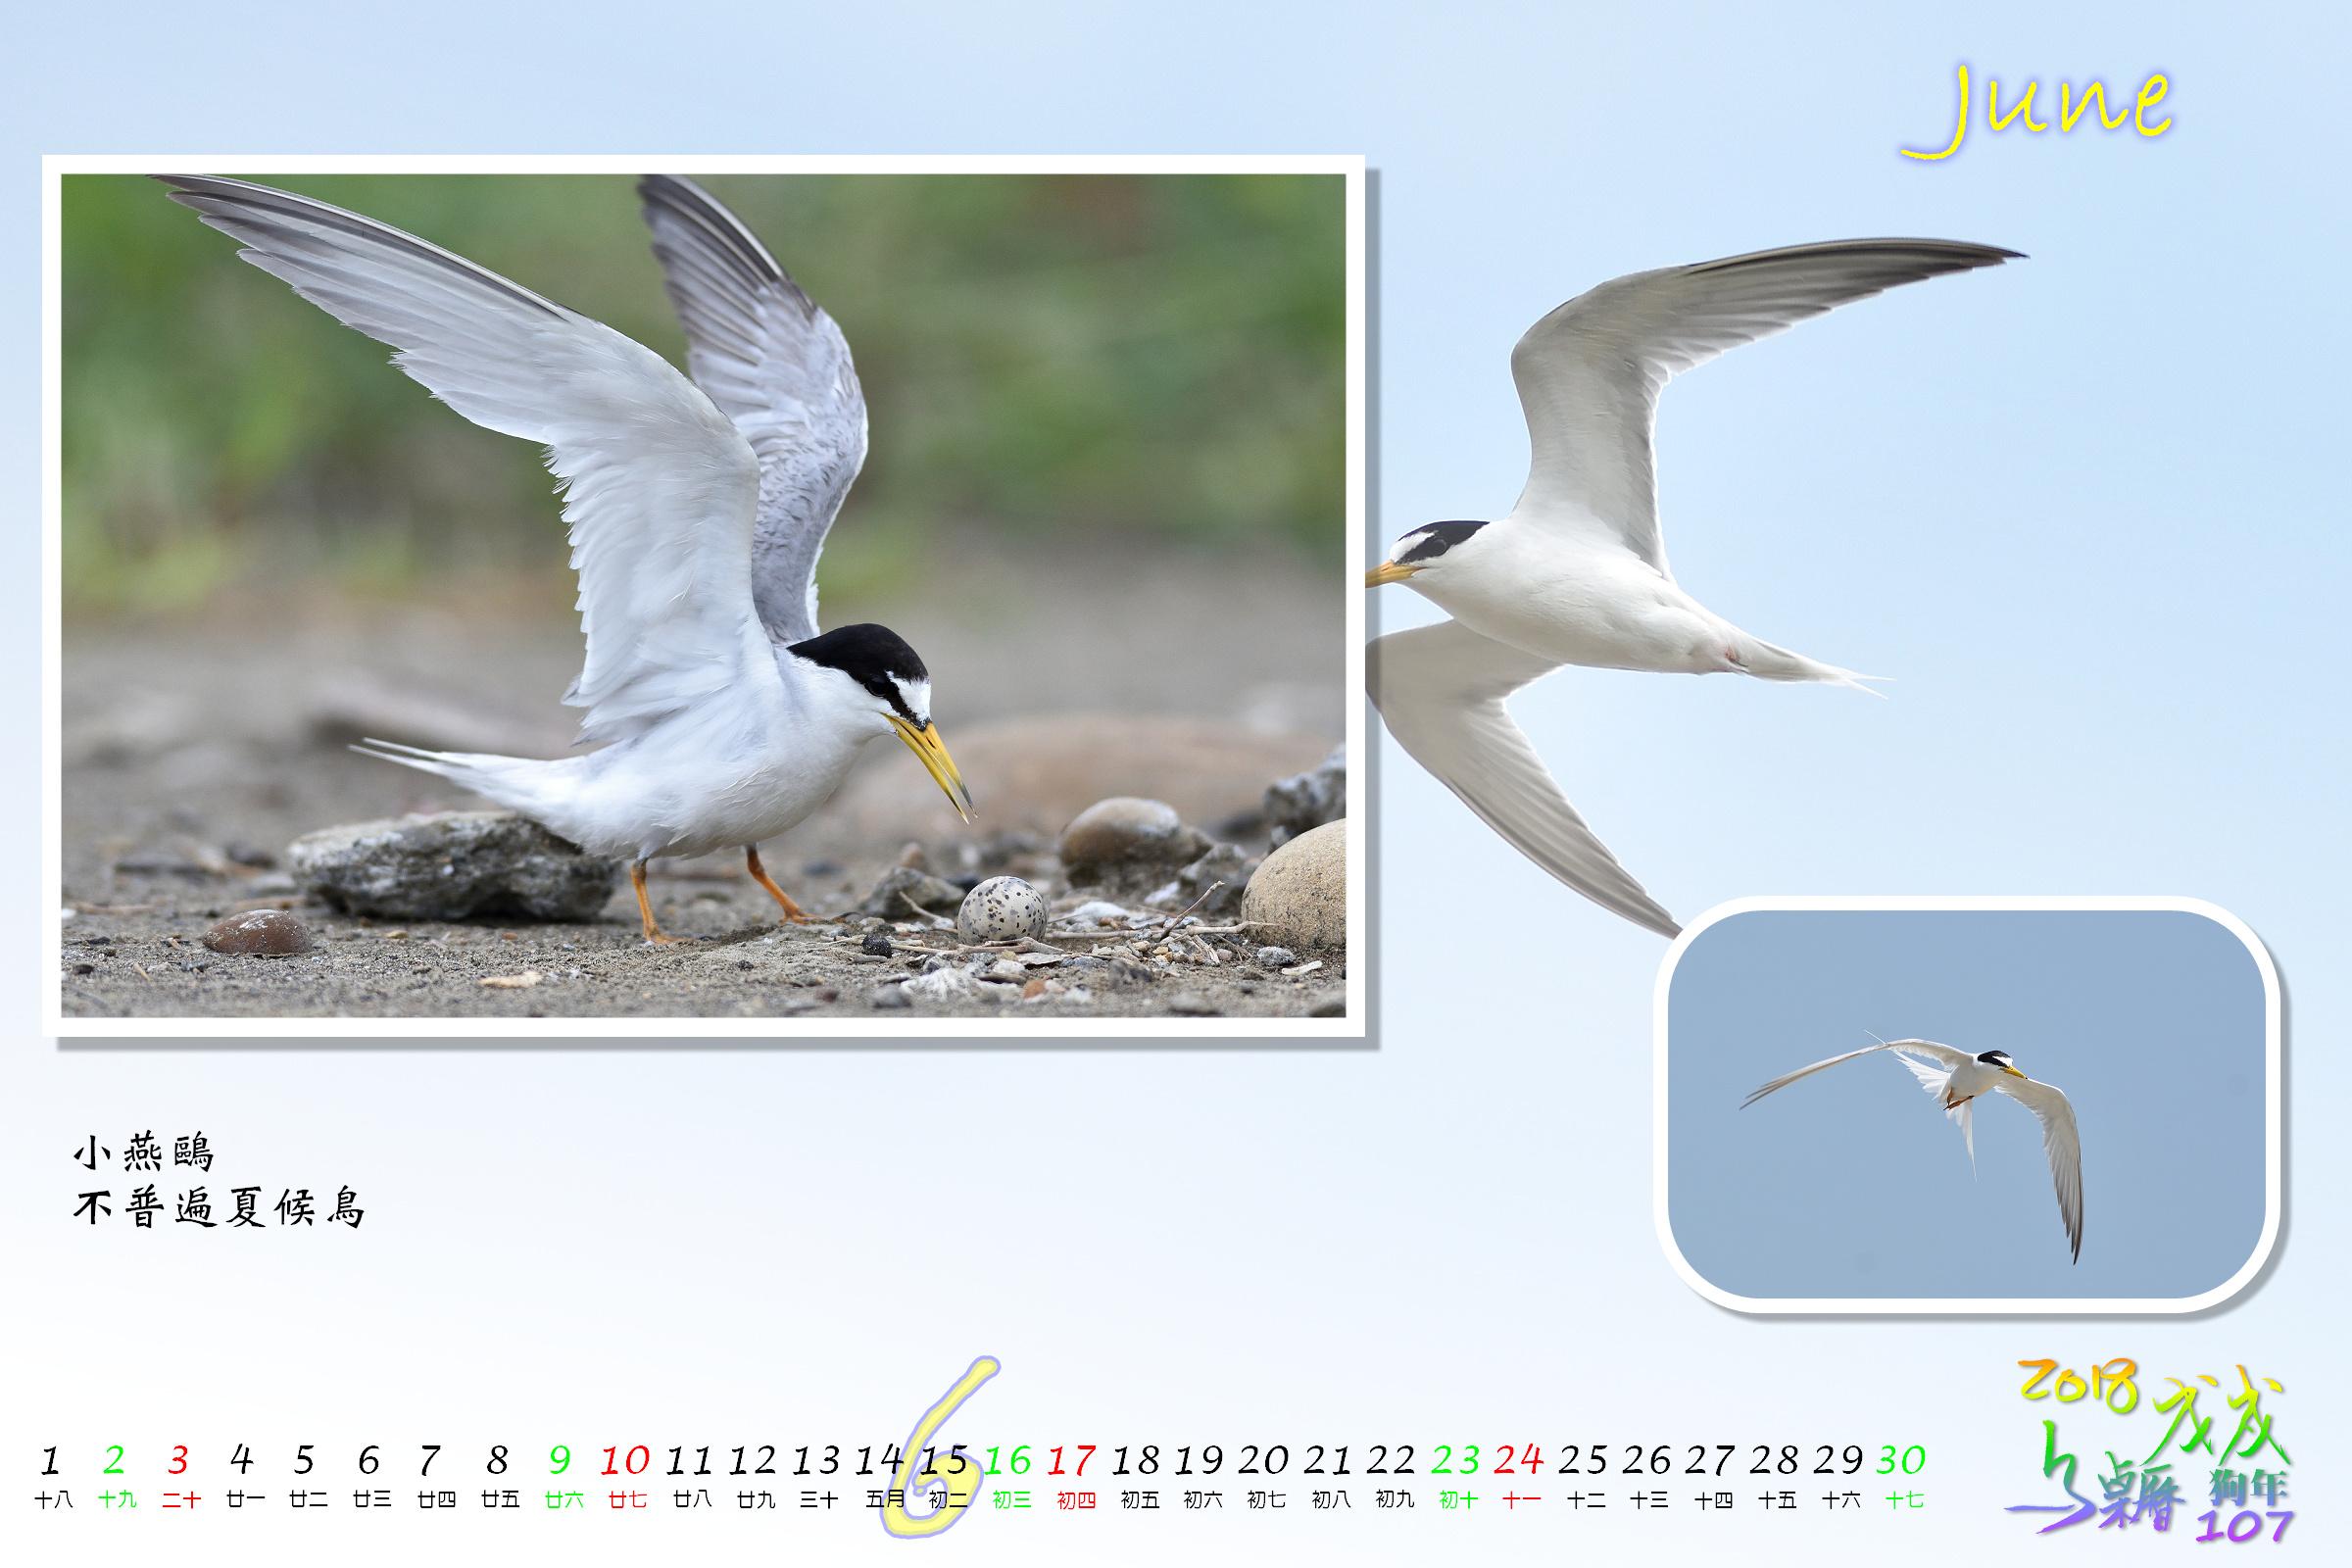 Calendar2018_Alder2_06